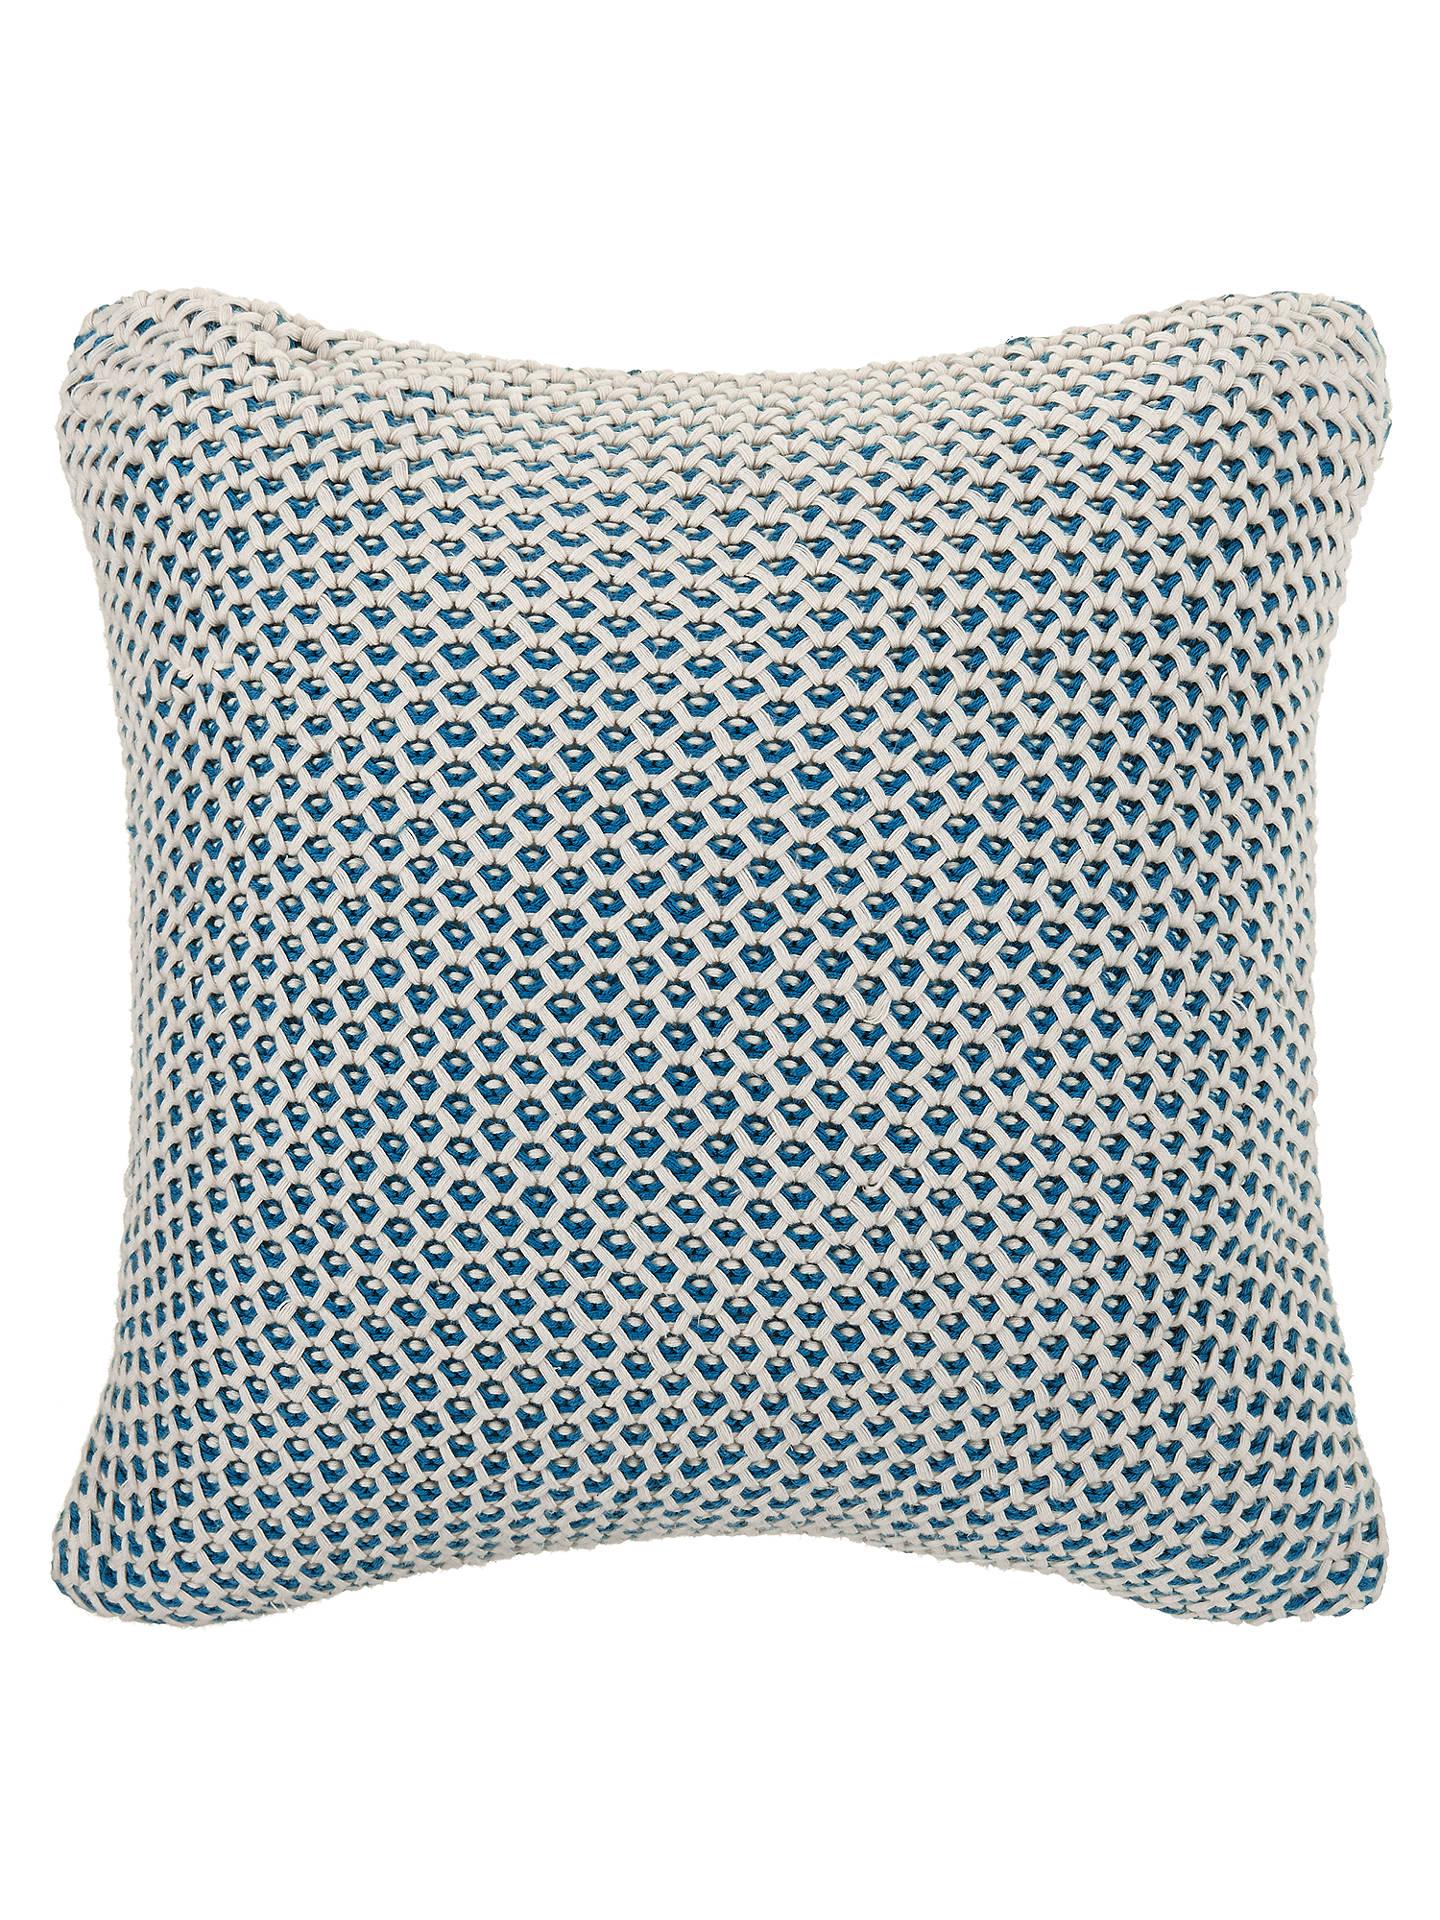 john lewis honeybee cushion spruce at john lewis partners. Black Bedroom Furniture Sets. Home Design Ideas